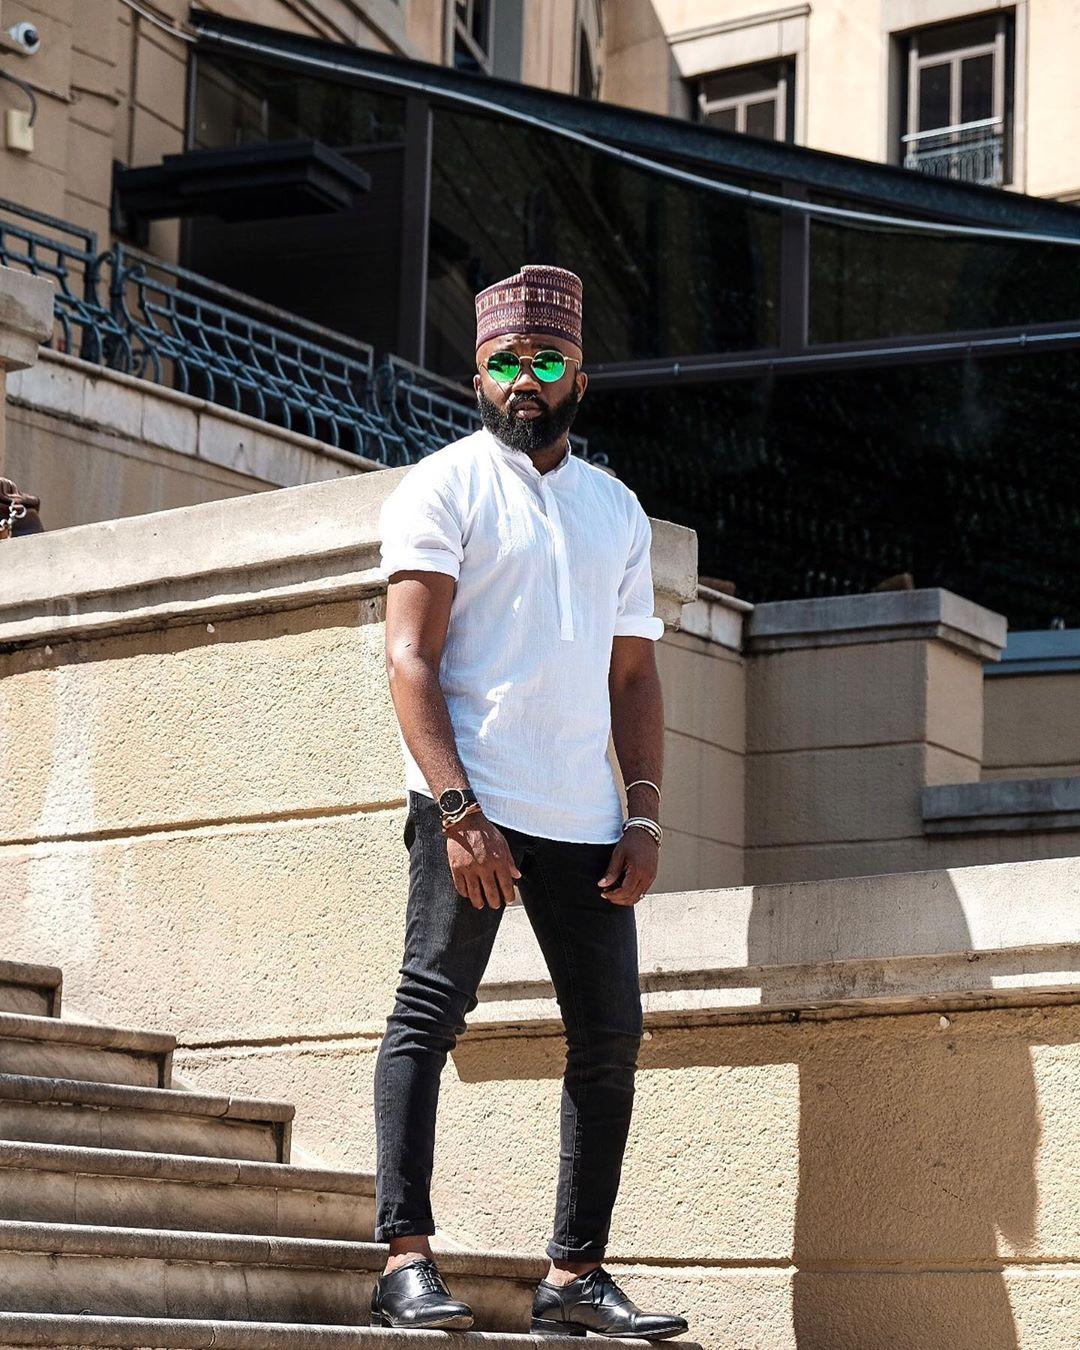 noble-igwe-nigerian-male-celebrities-style